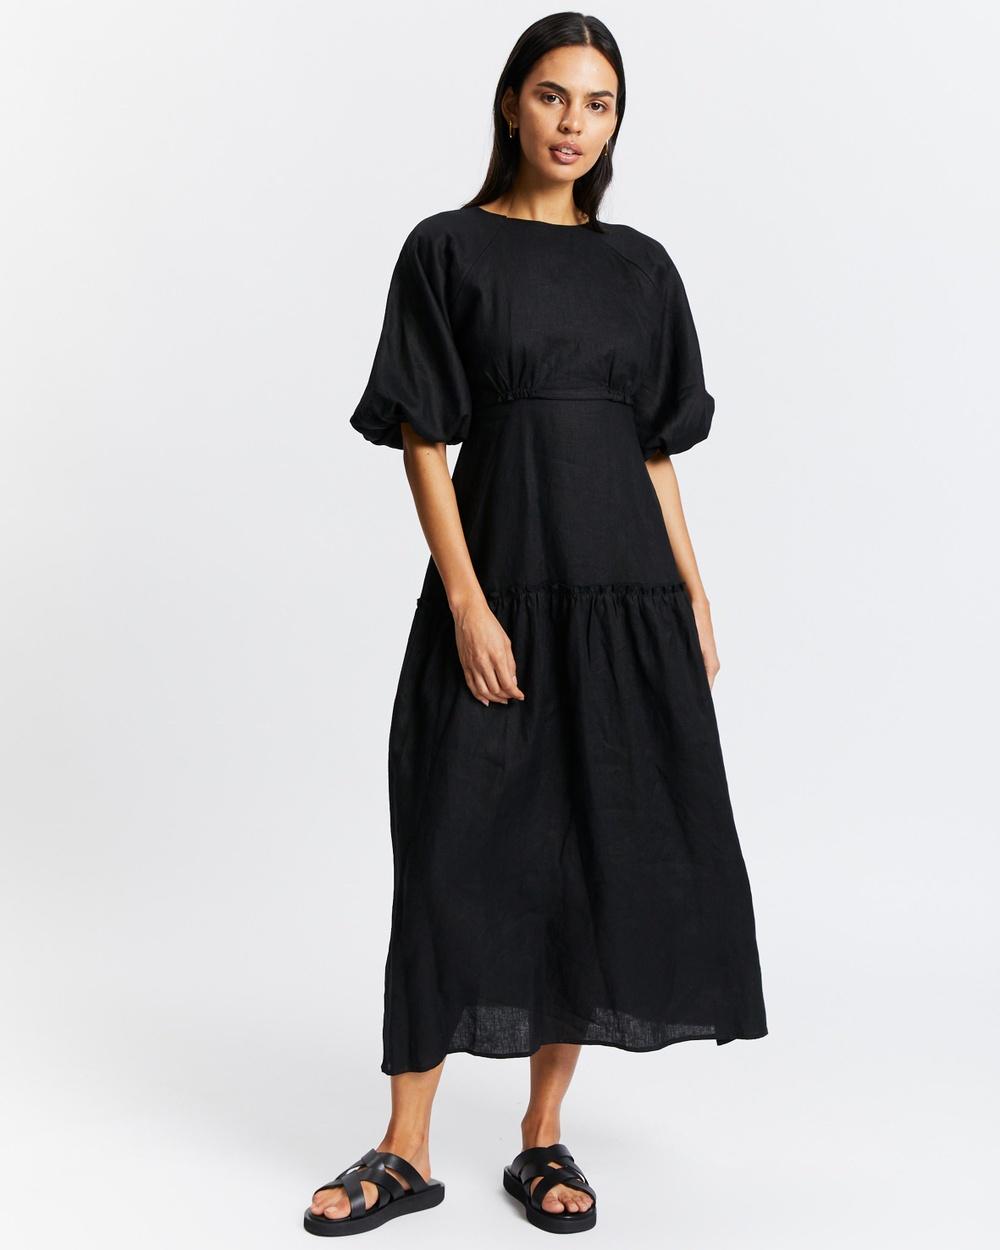 AERE Tie Back Linen Tea Dress Dresses Black